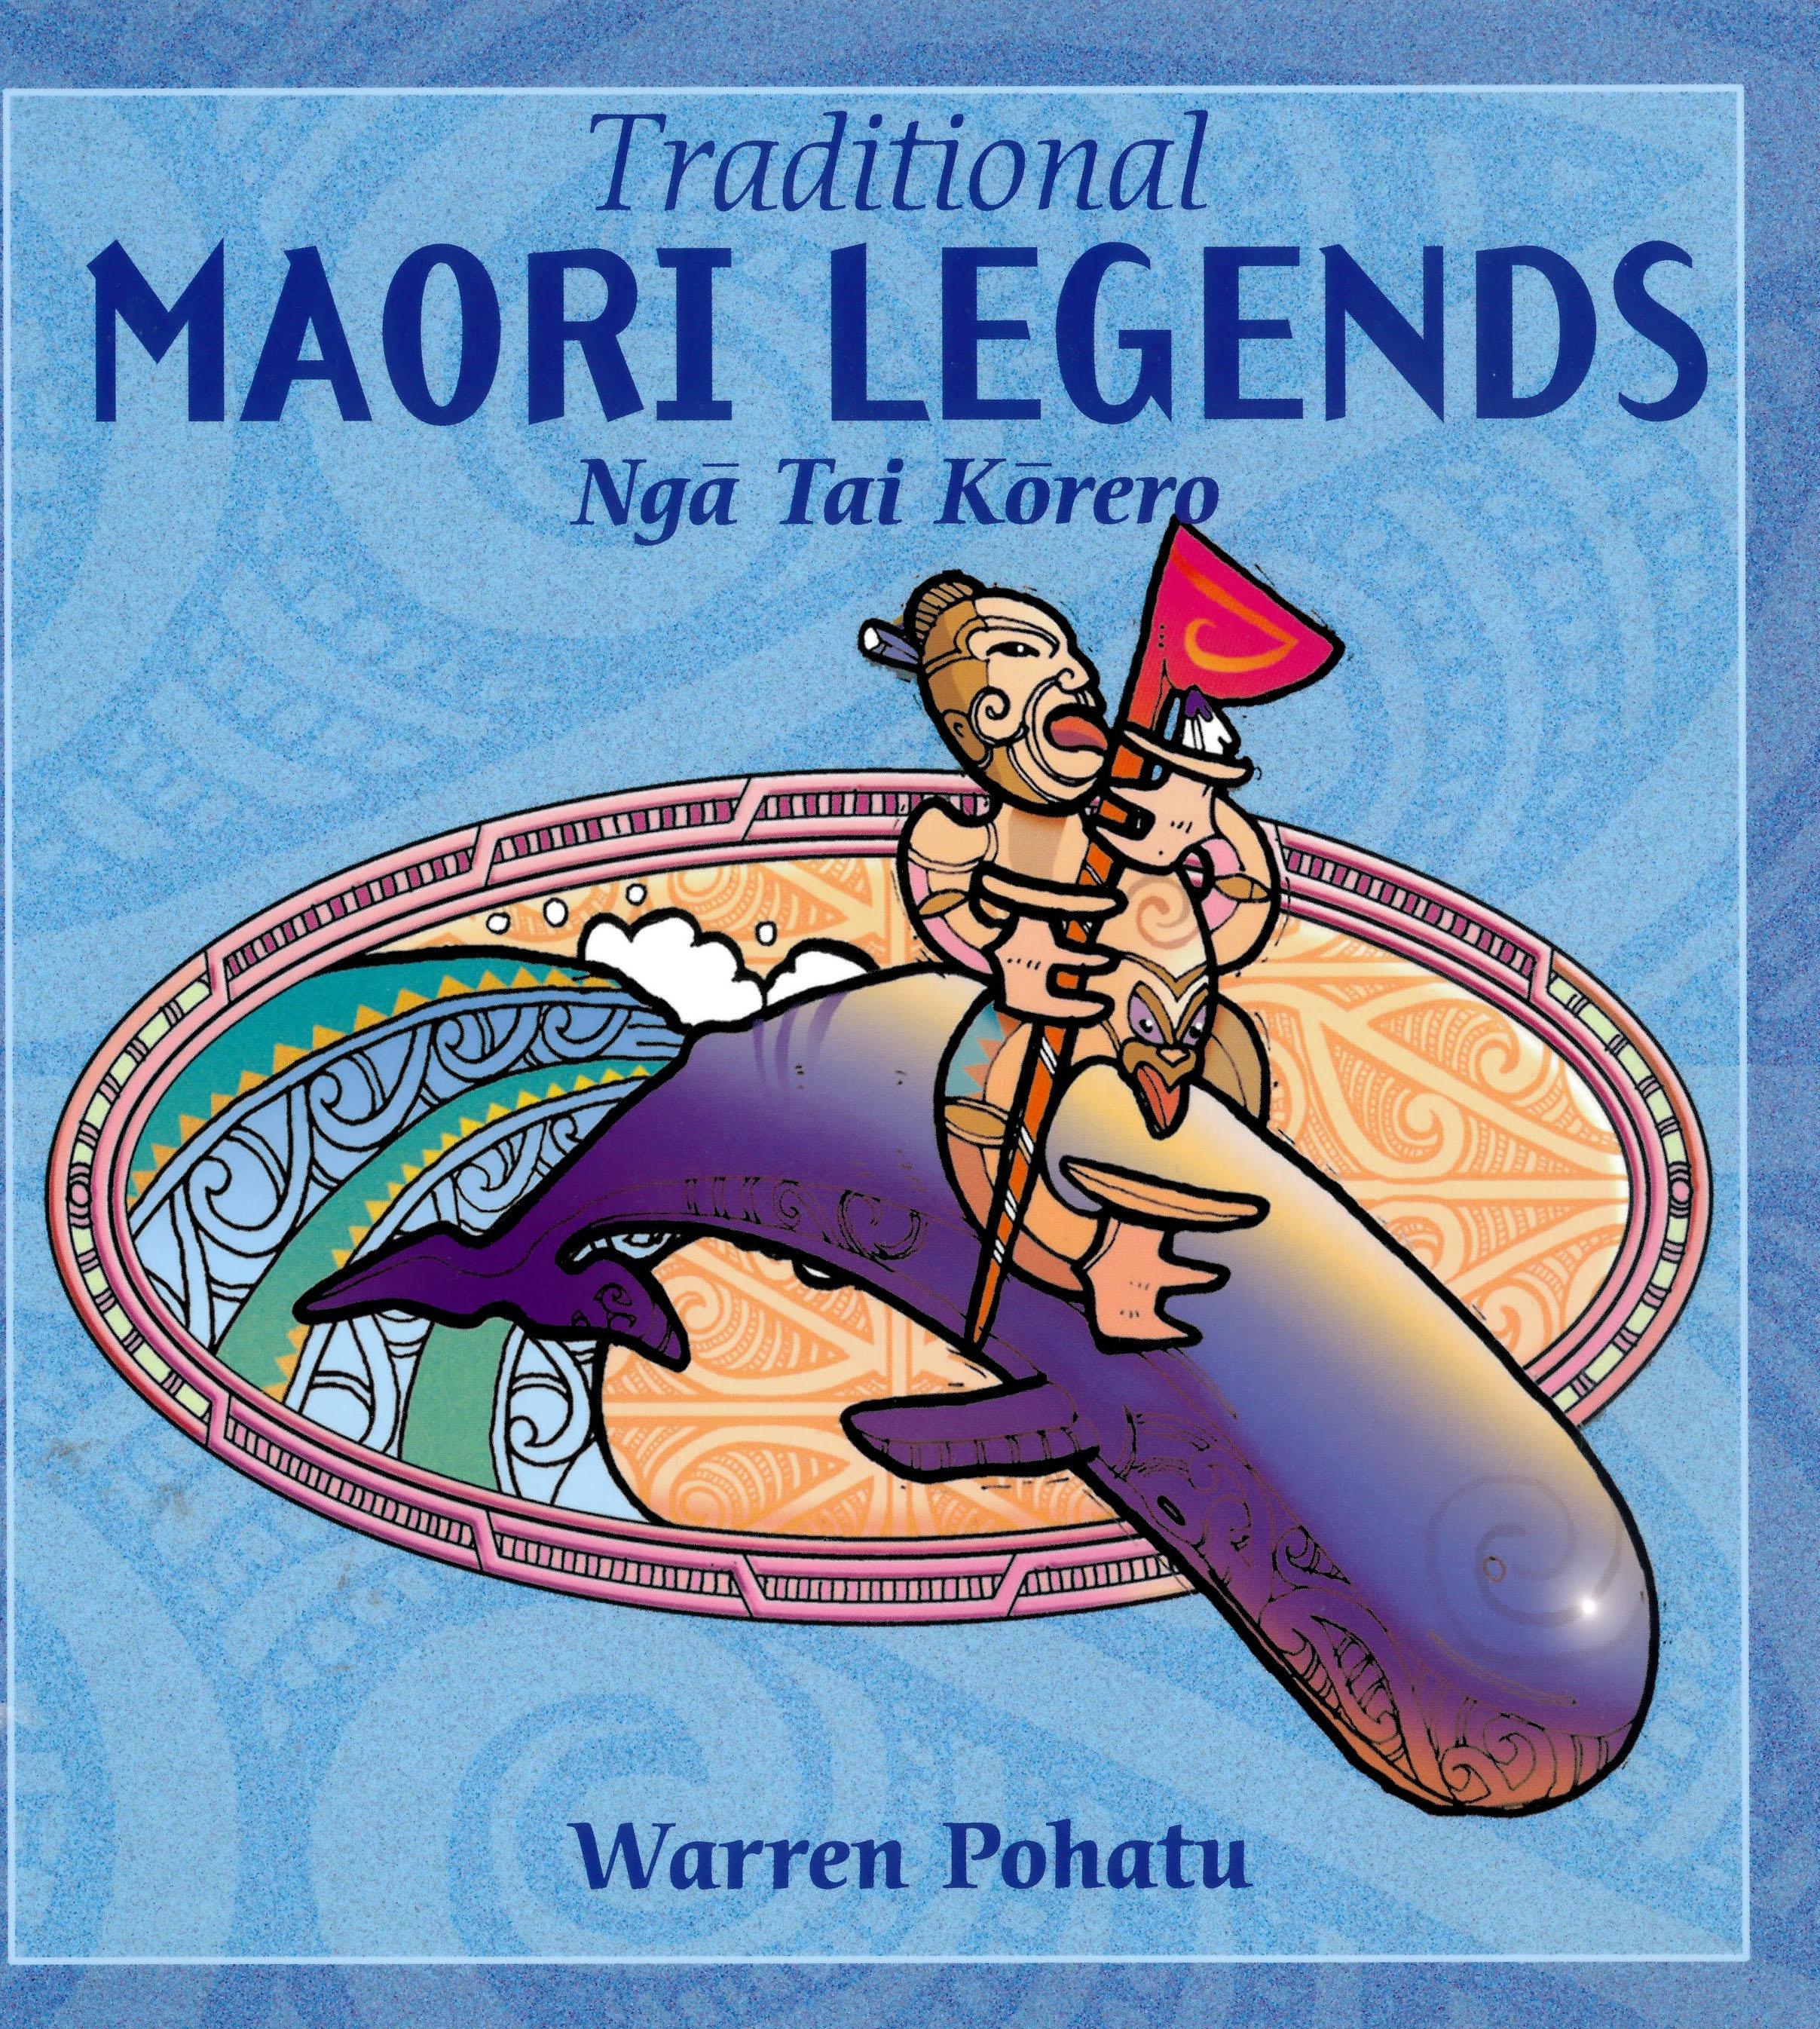 Maori Mythology: Traditional Maori Legends